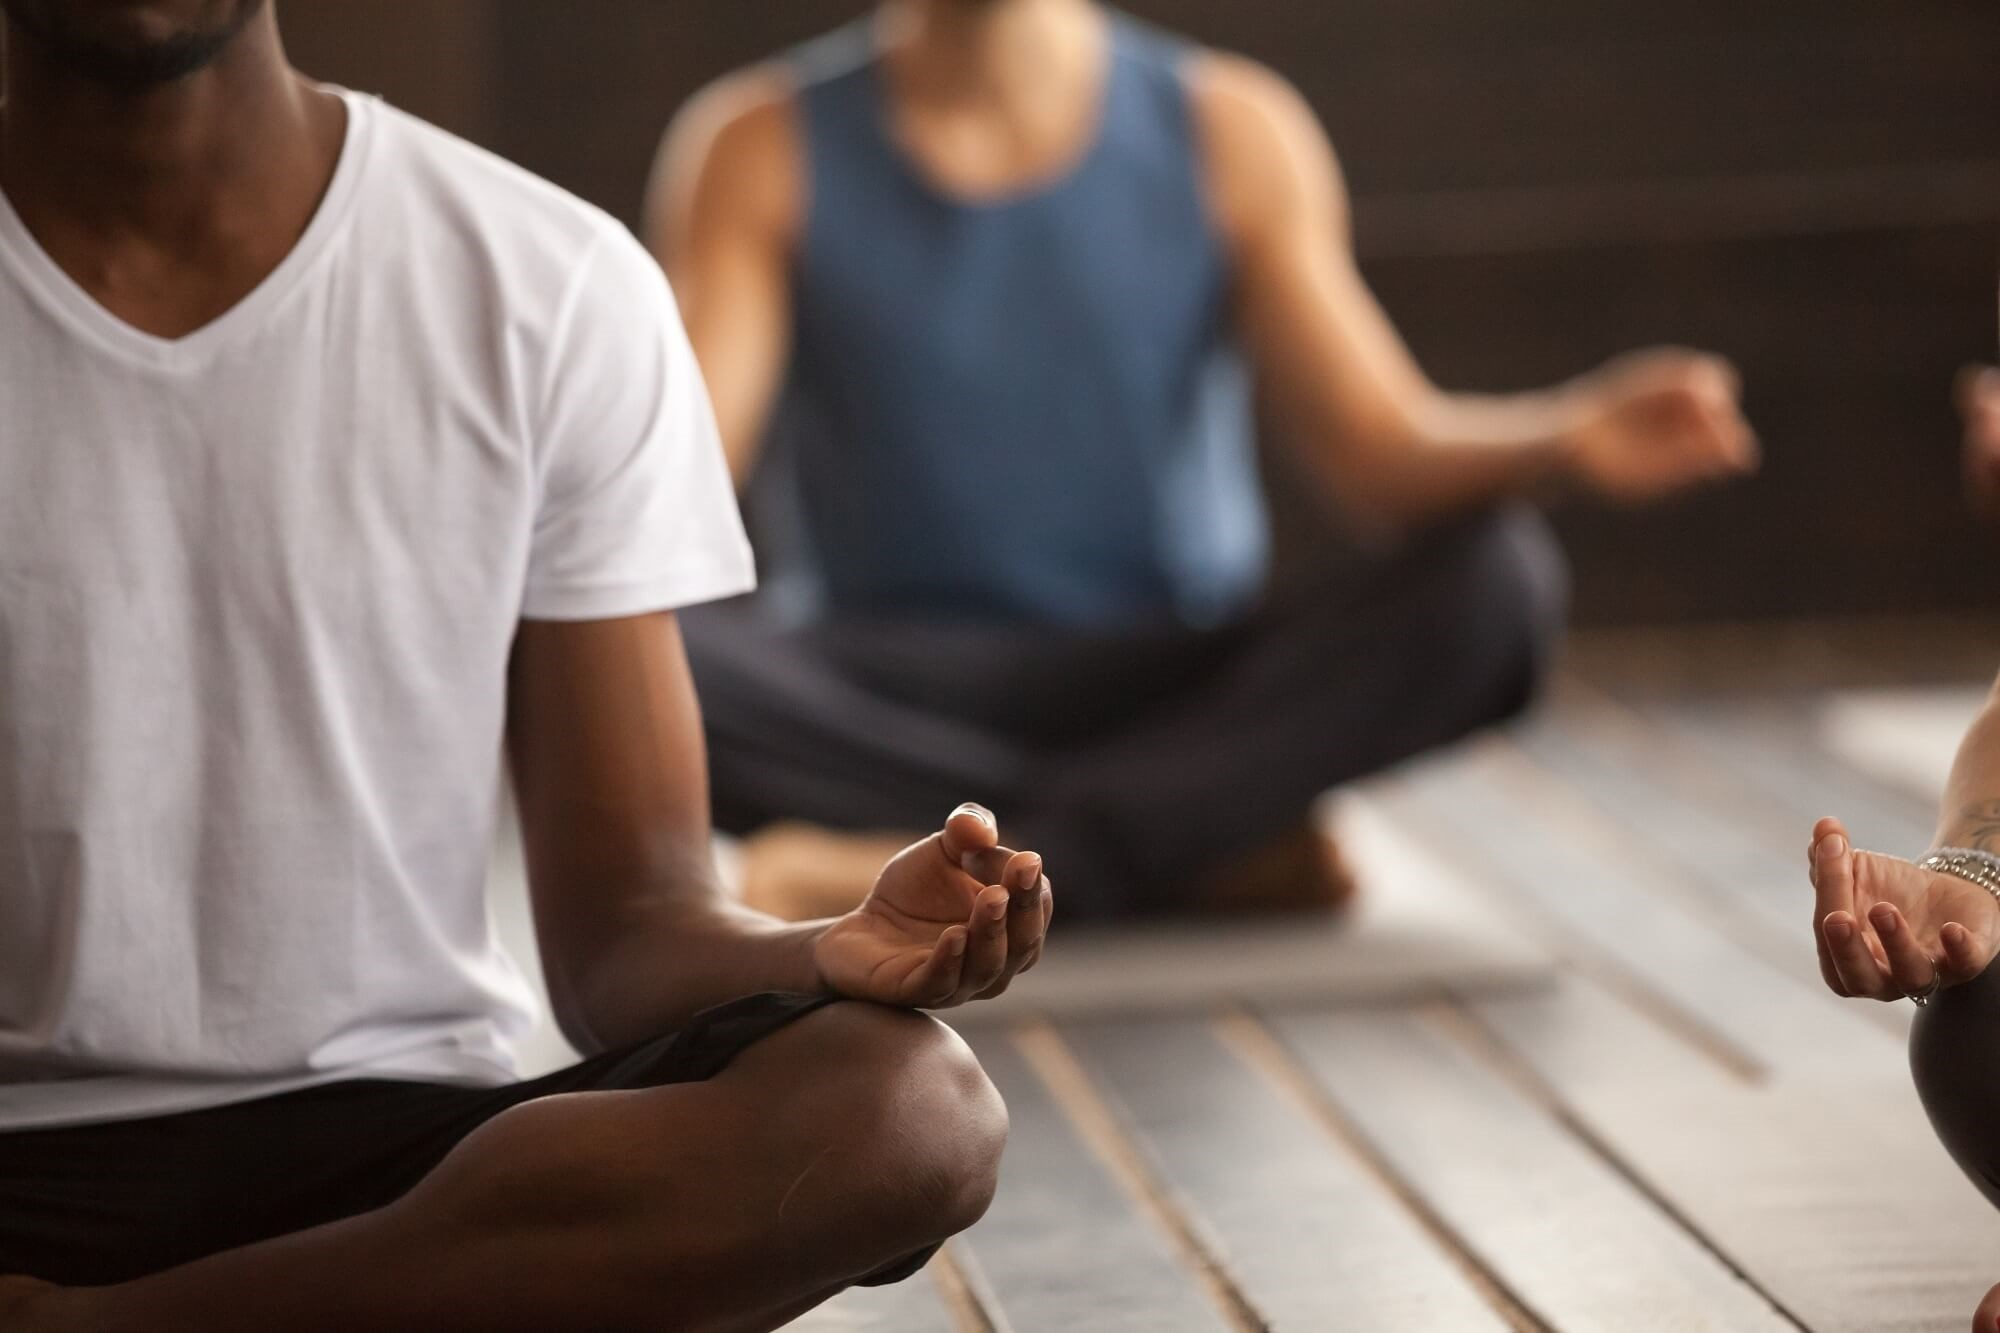 Transcendental Meditation Reduces PTSD Symptom Severity in Veterans